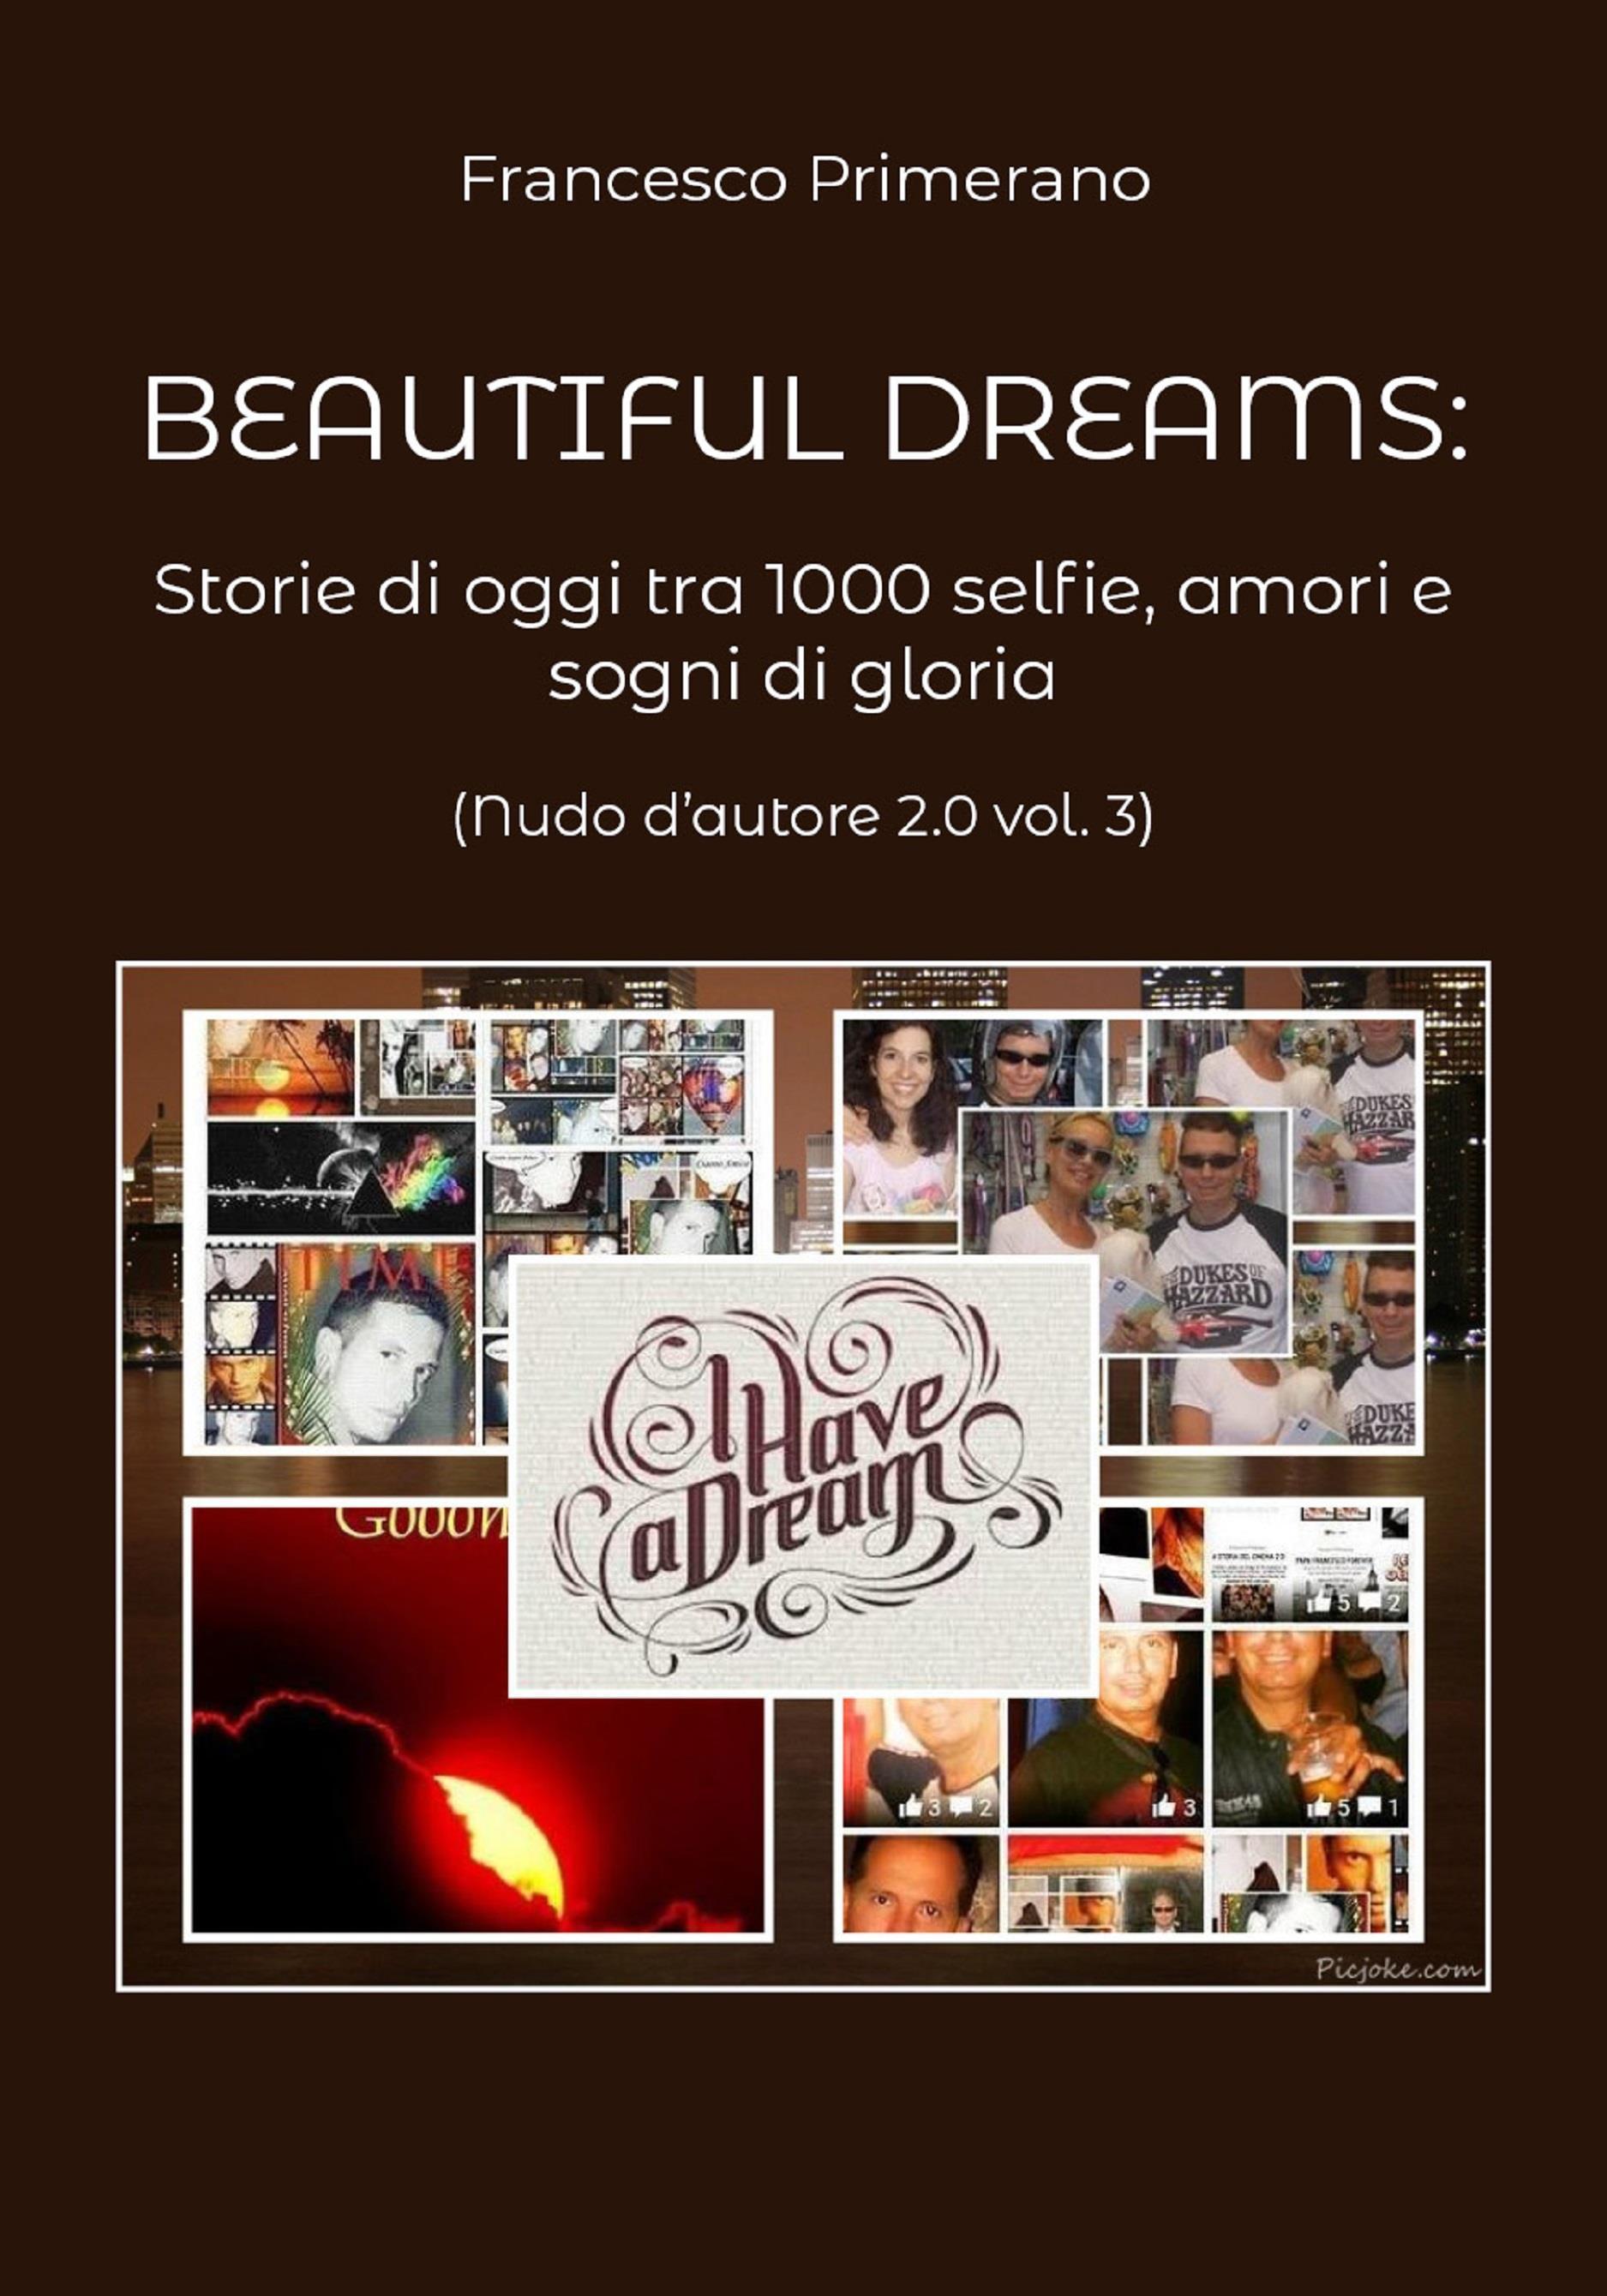 Beautiful dreams. Storie di oggi tra 1000 selfie, amori e sogni di gloria (Nudo d'autore 2.0 vol. 3)